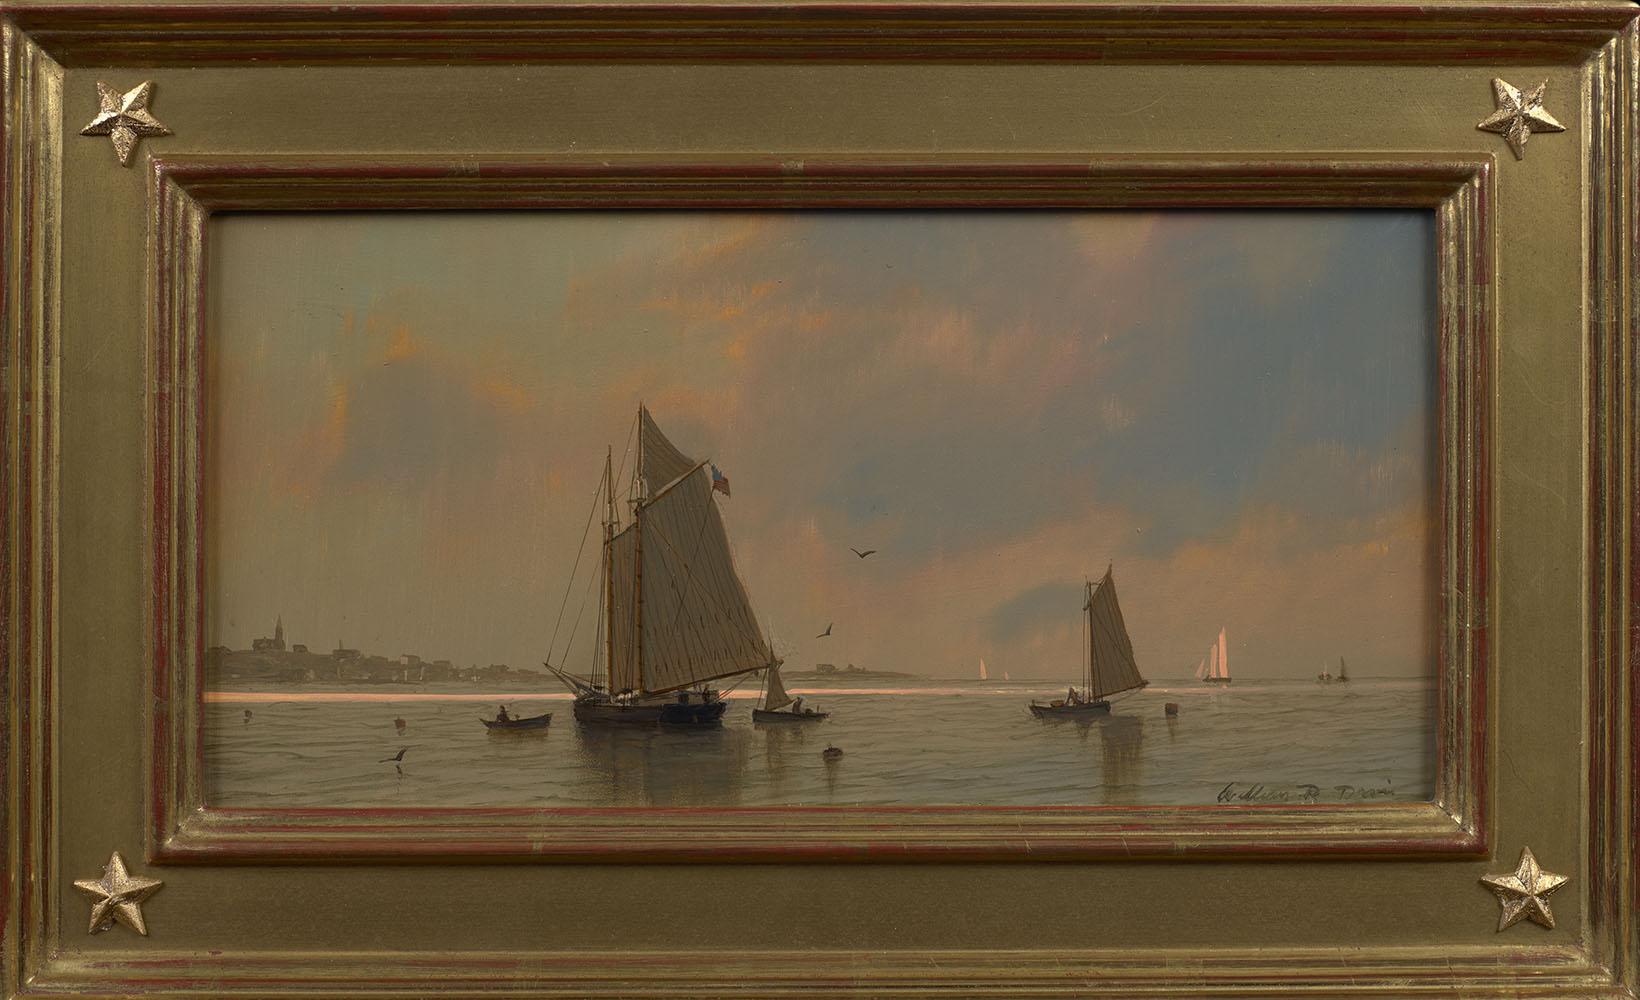 william_davis_fishing_schooner_at_work_framed.jpg